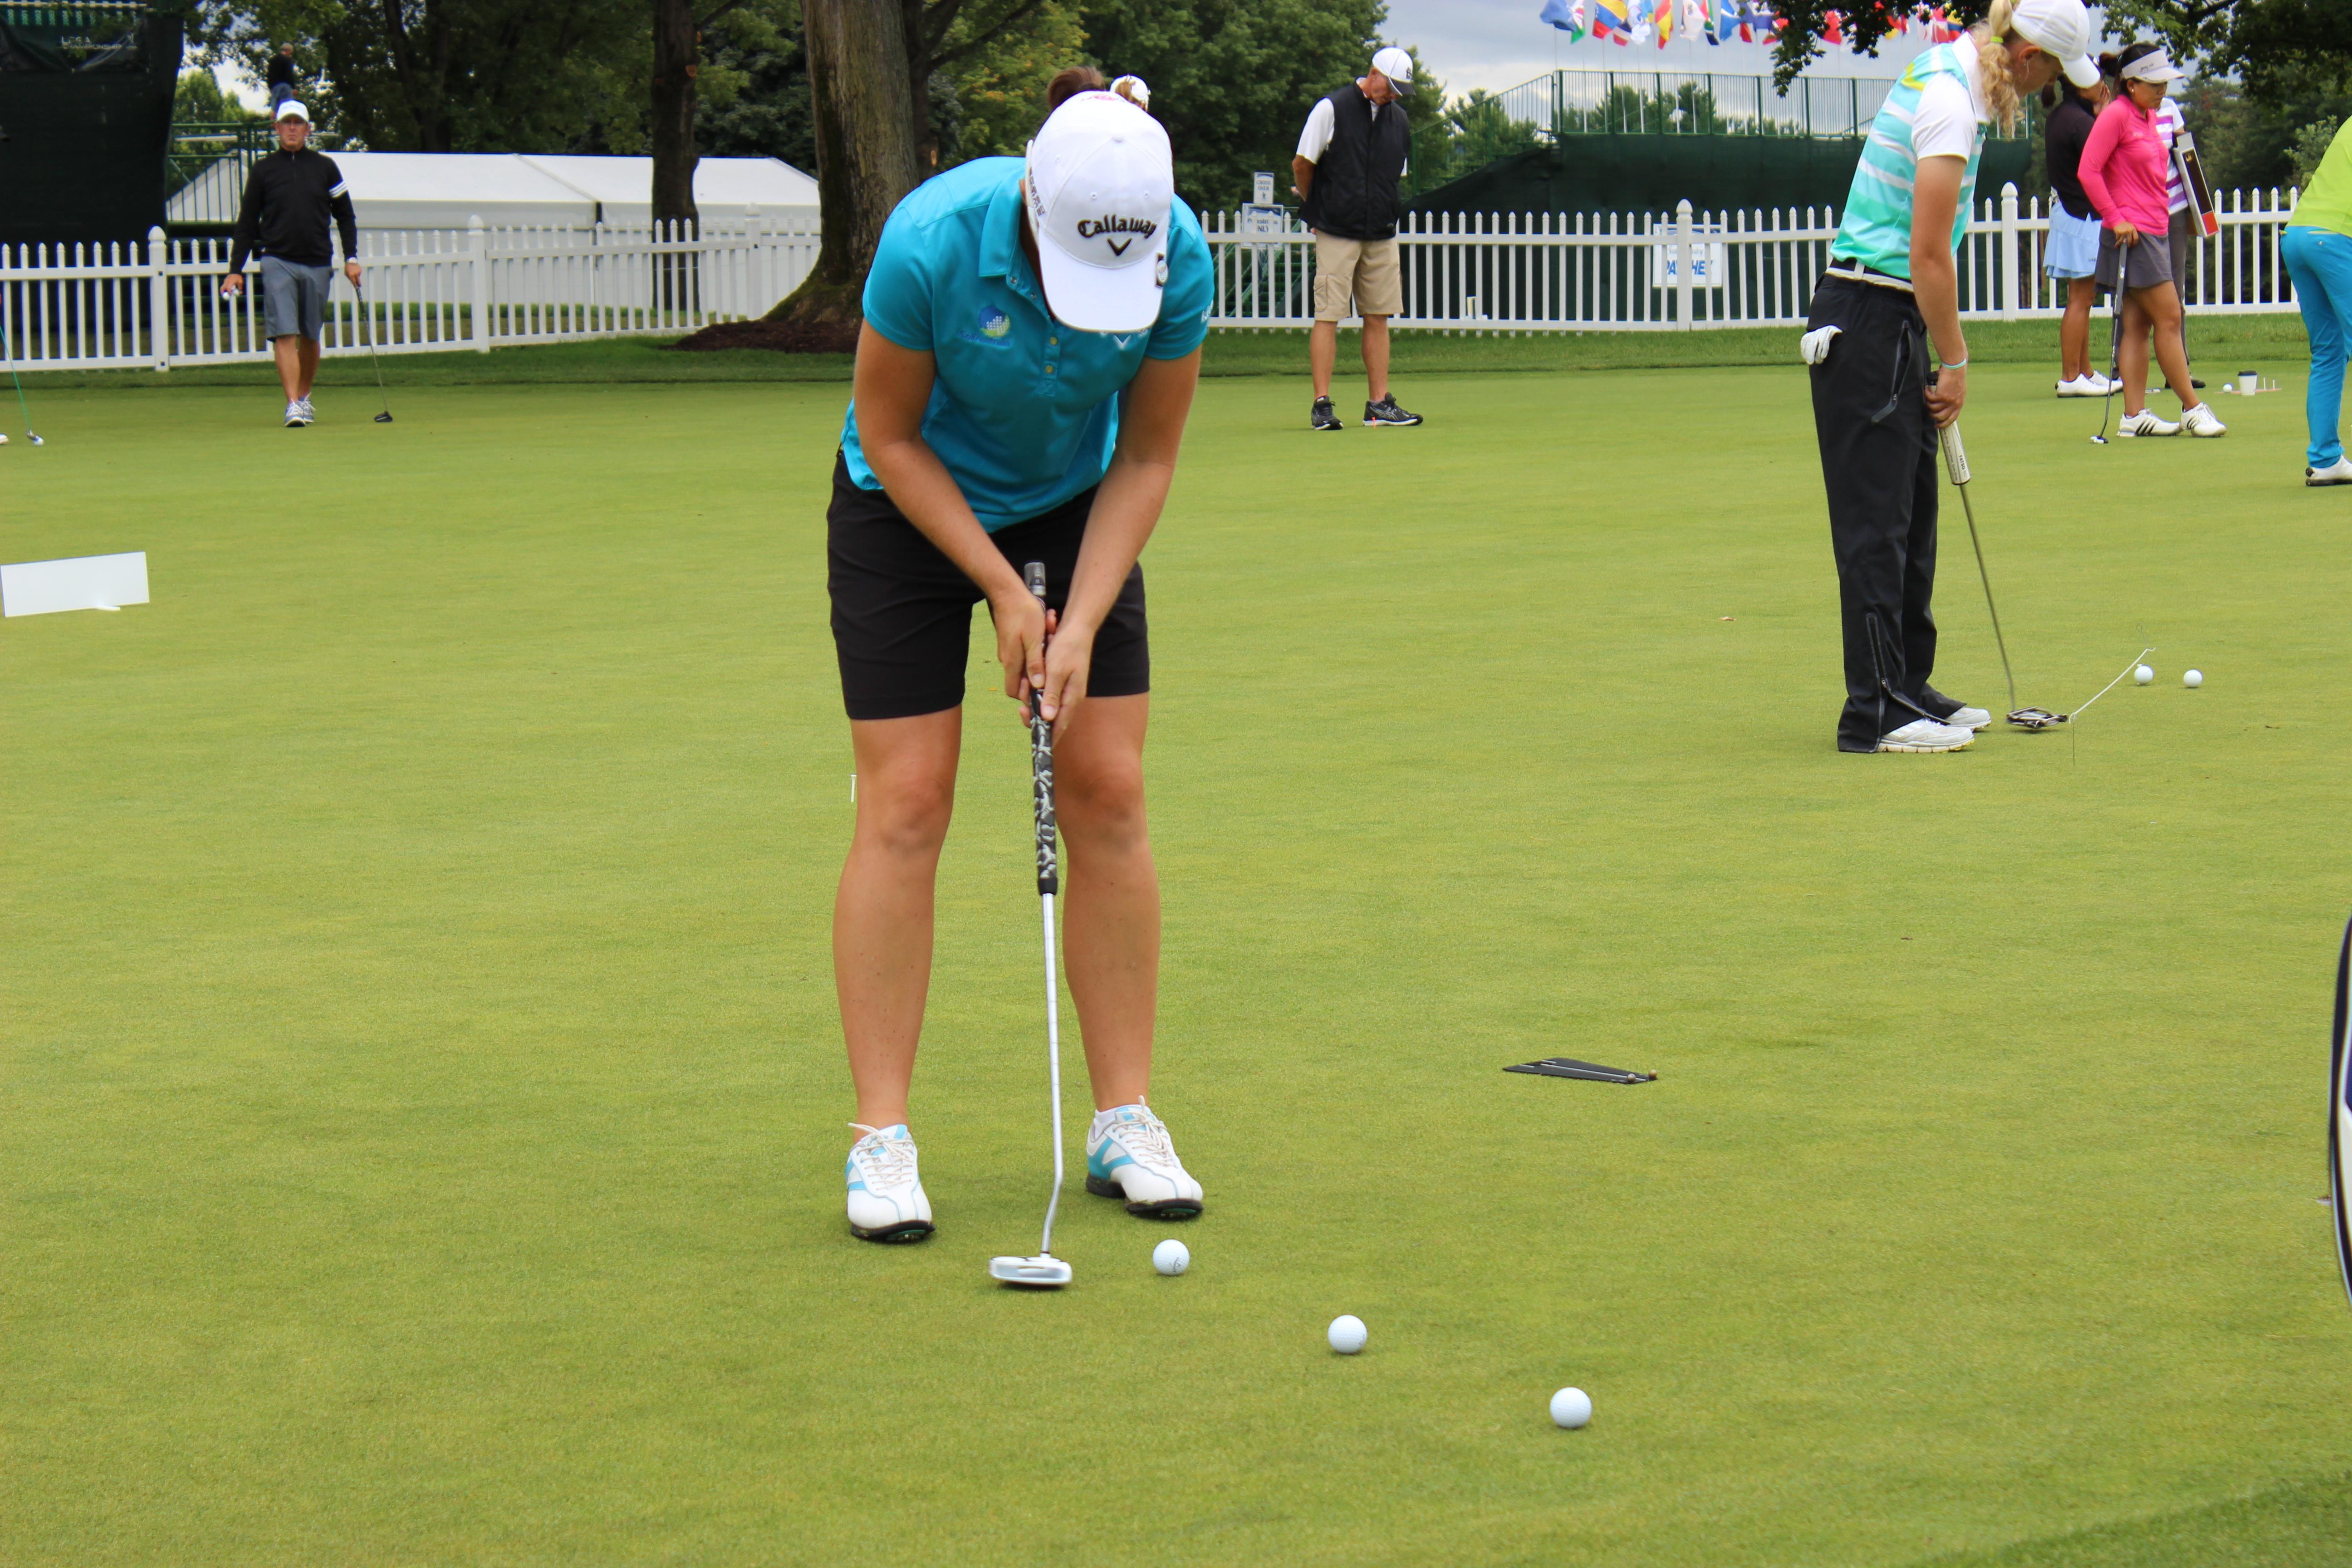 Life-Styles-with-Pretty- Price-Wegmans-LPGA- Championship-Practice-Round-7